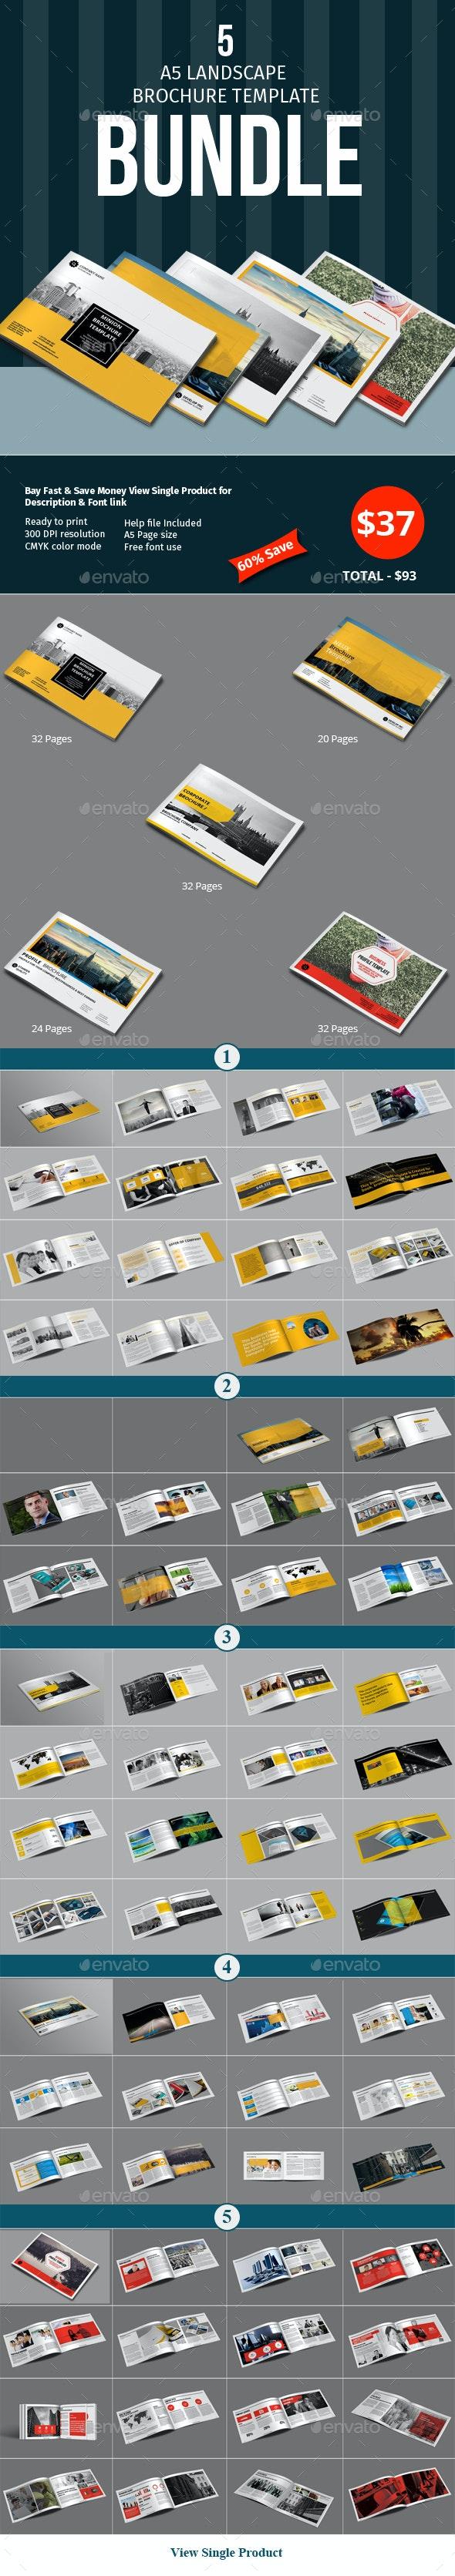 A5 Lanscape Brochure Template Bundle - Corporate Brochures